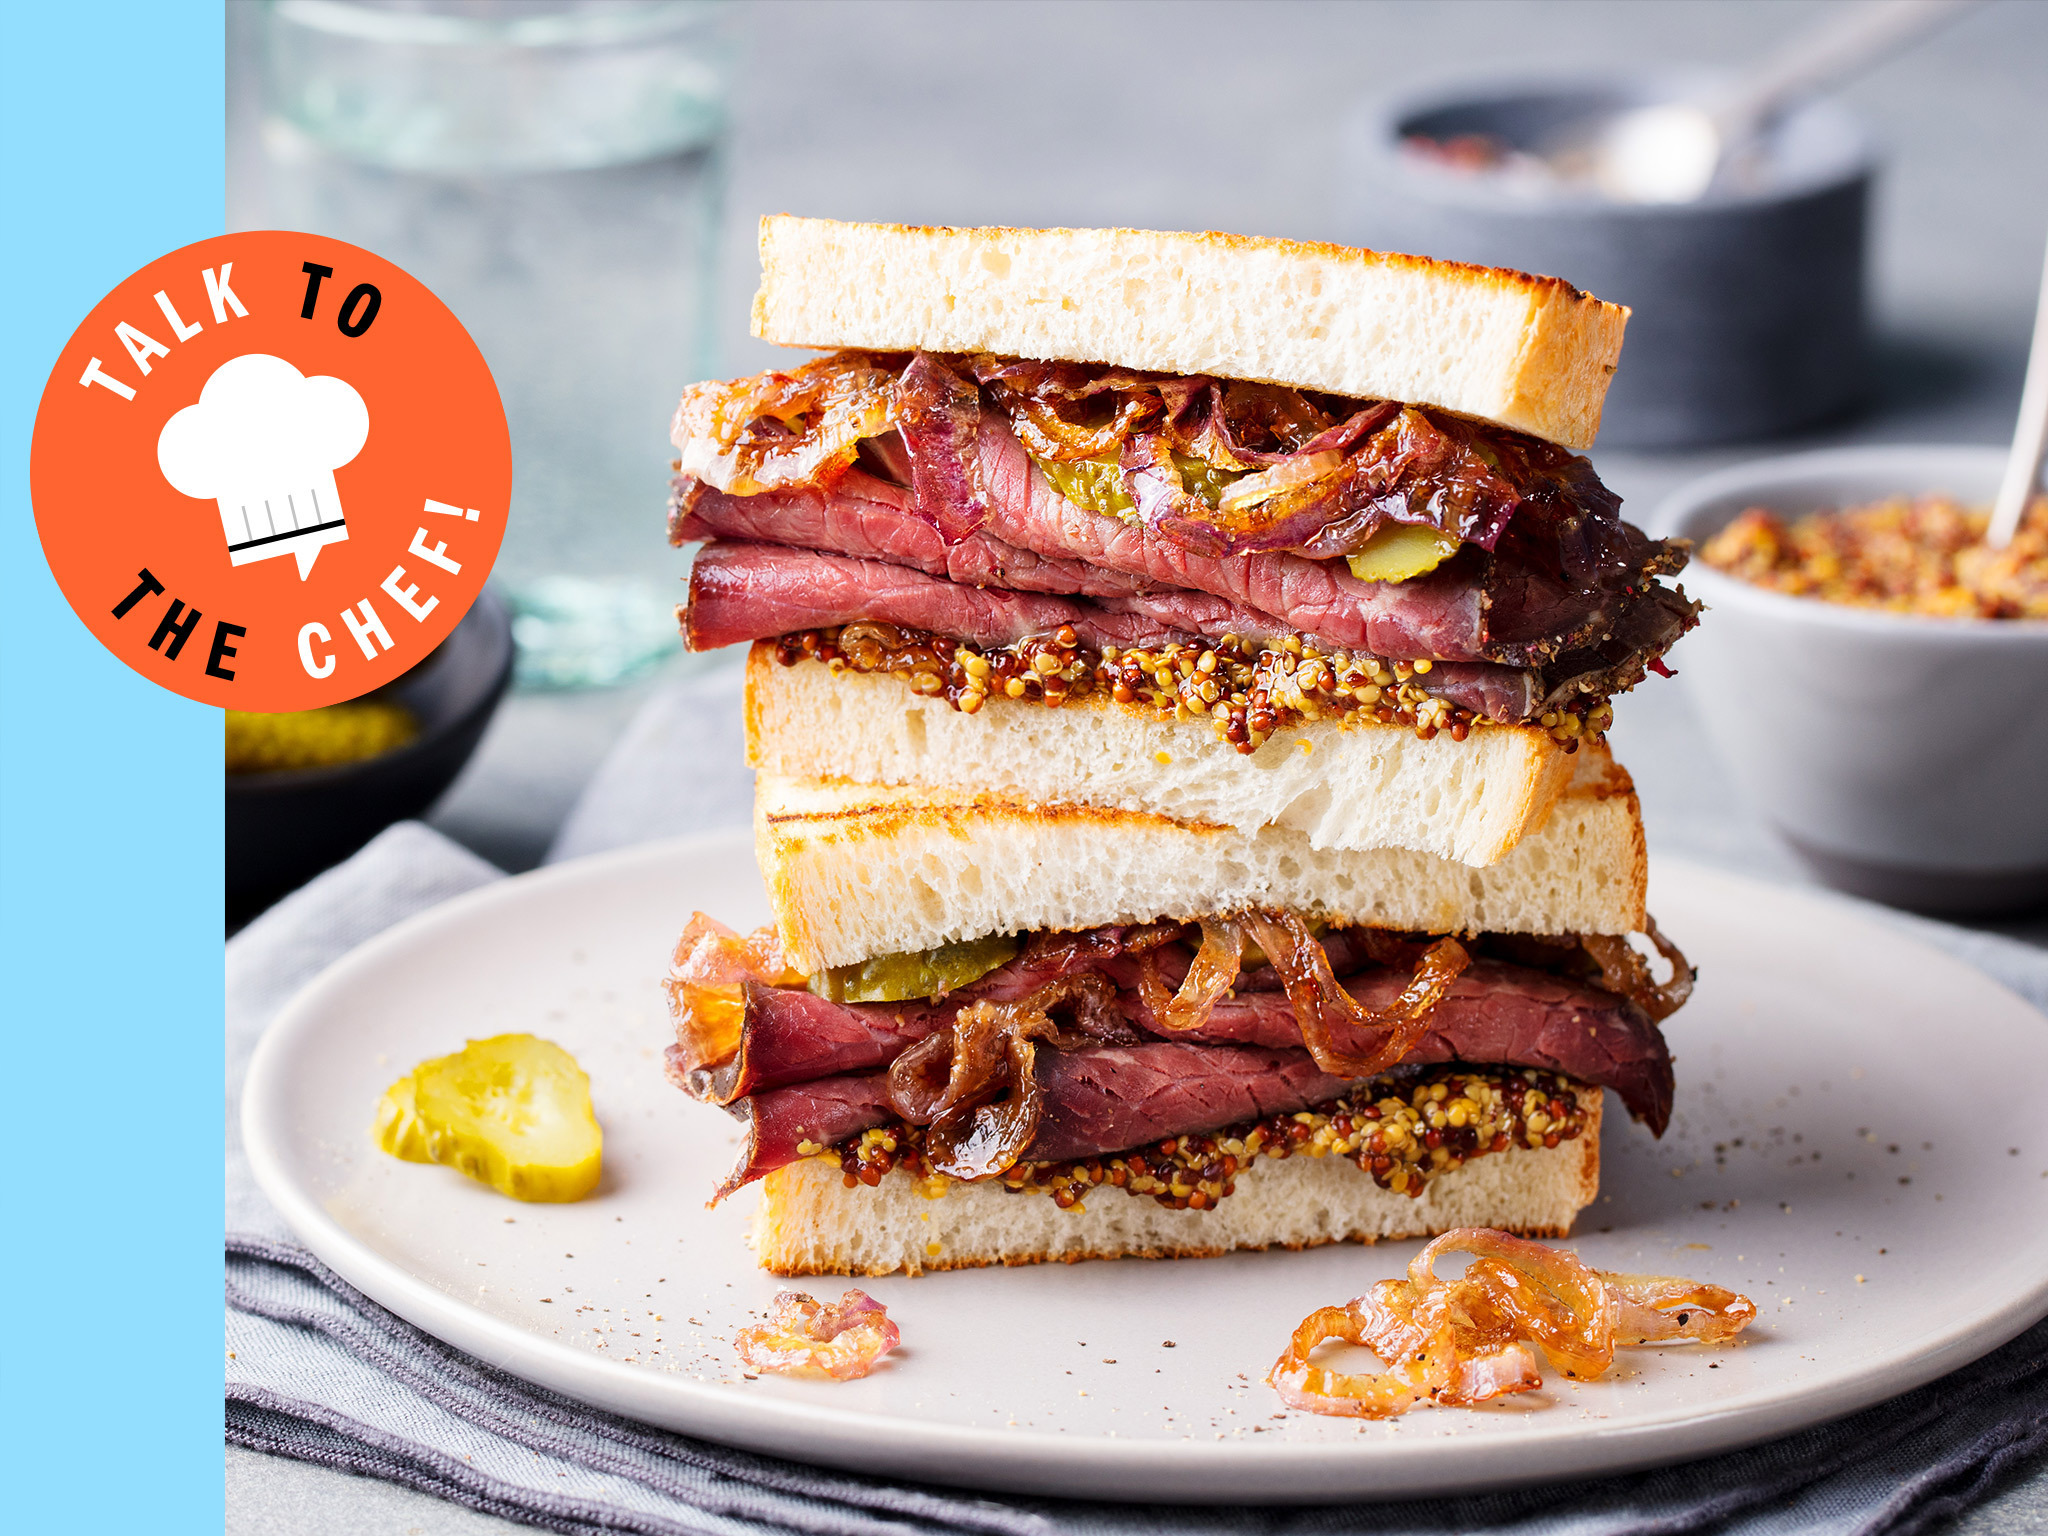 Talk to the Chef Sandwich